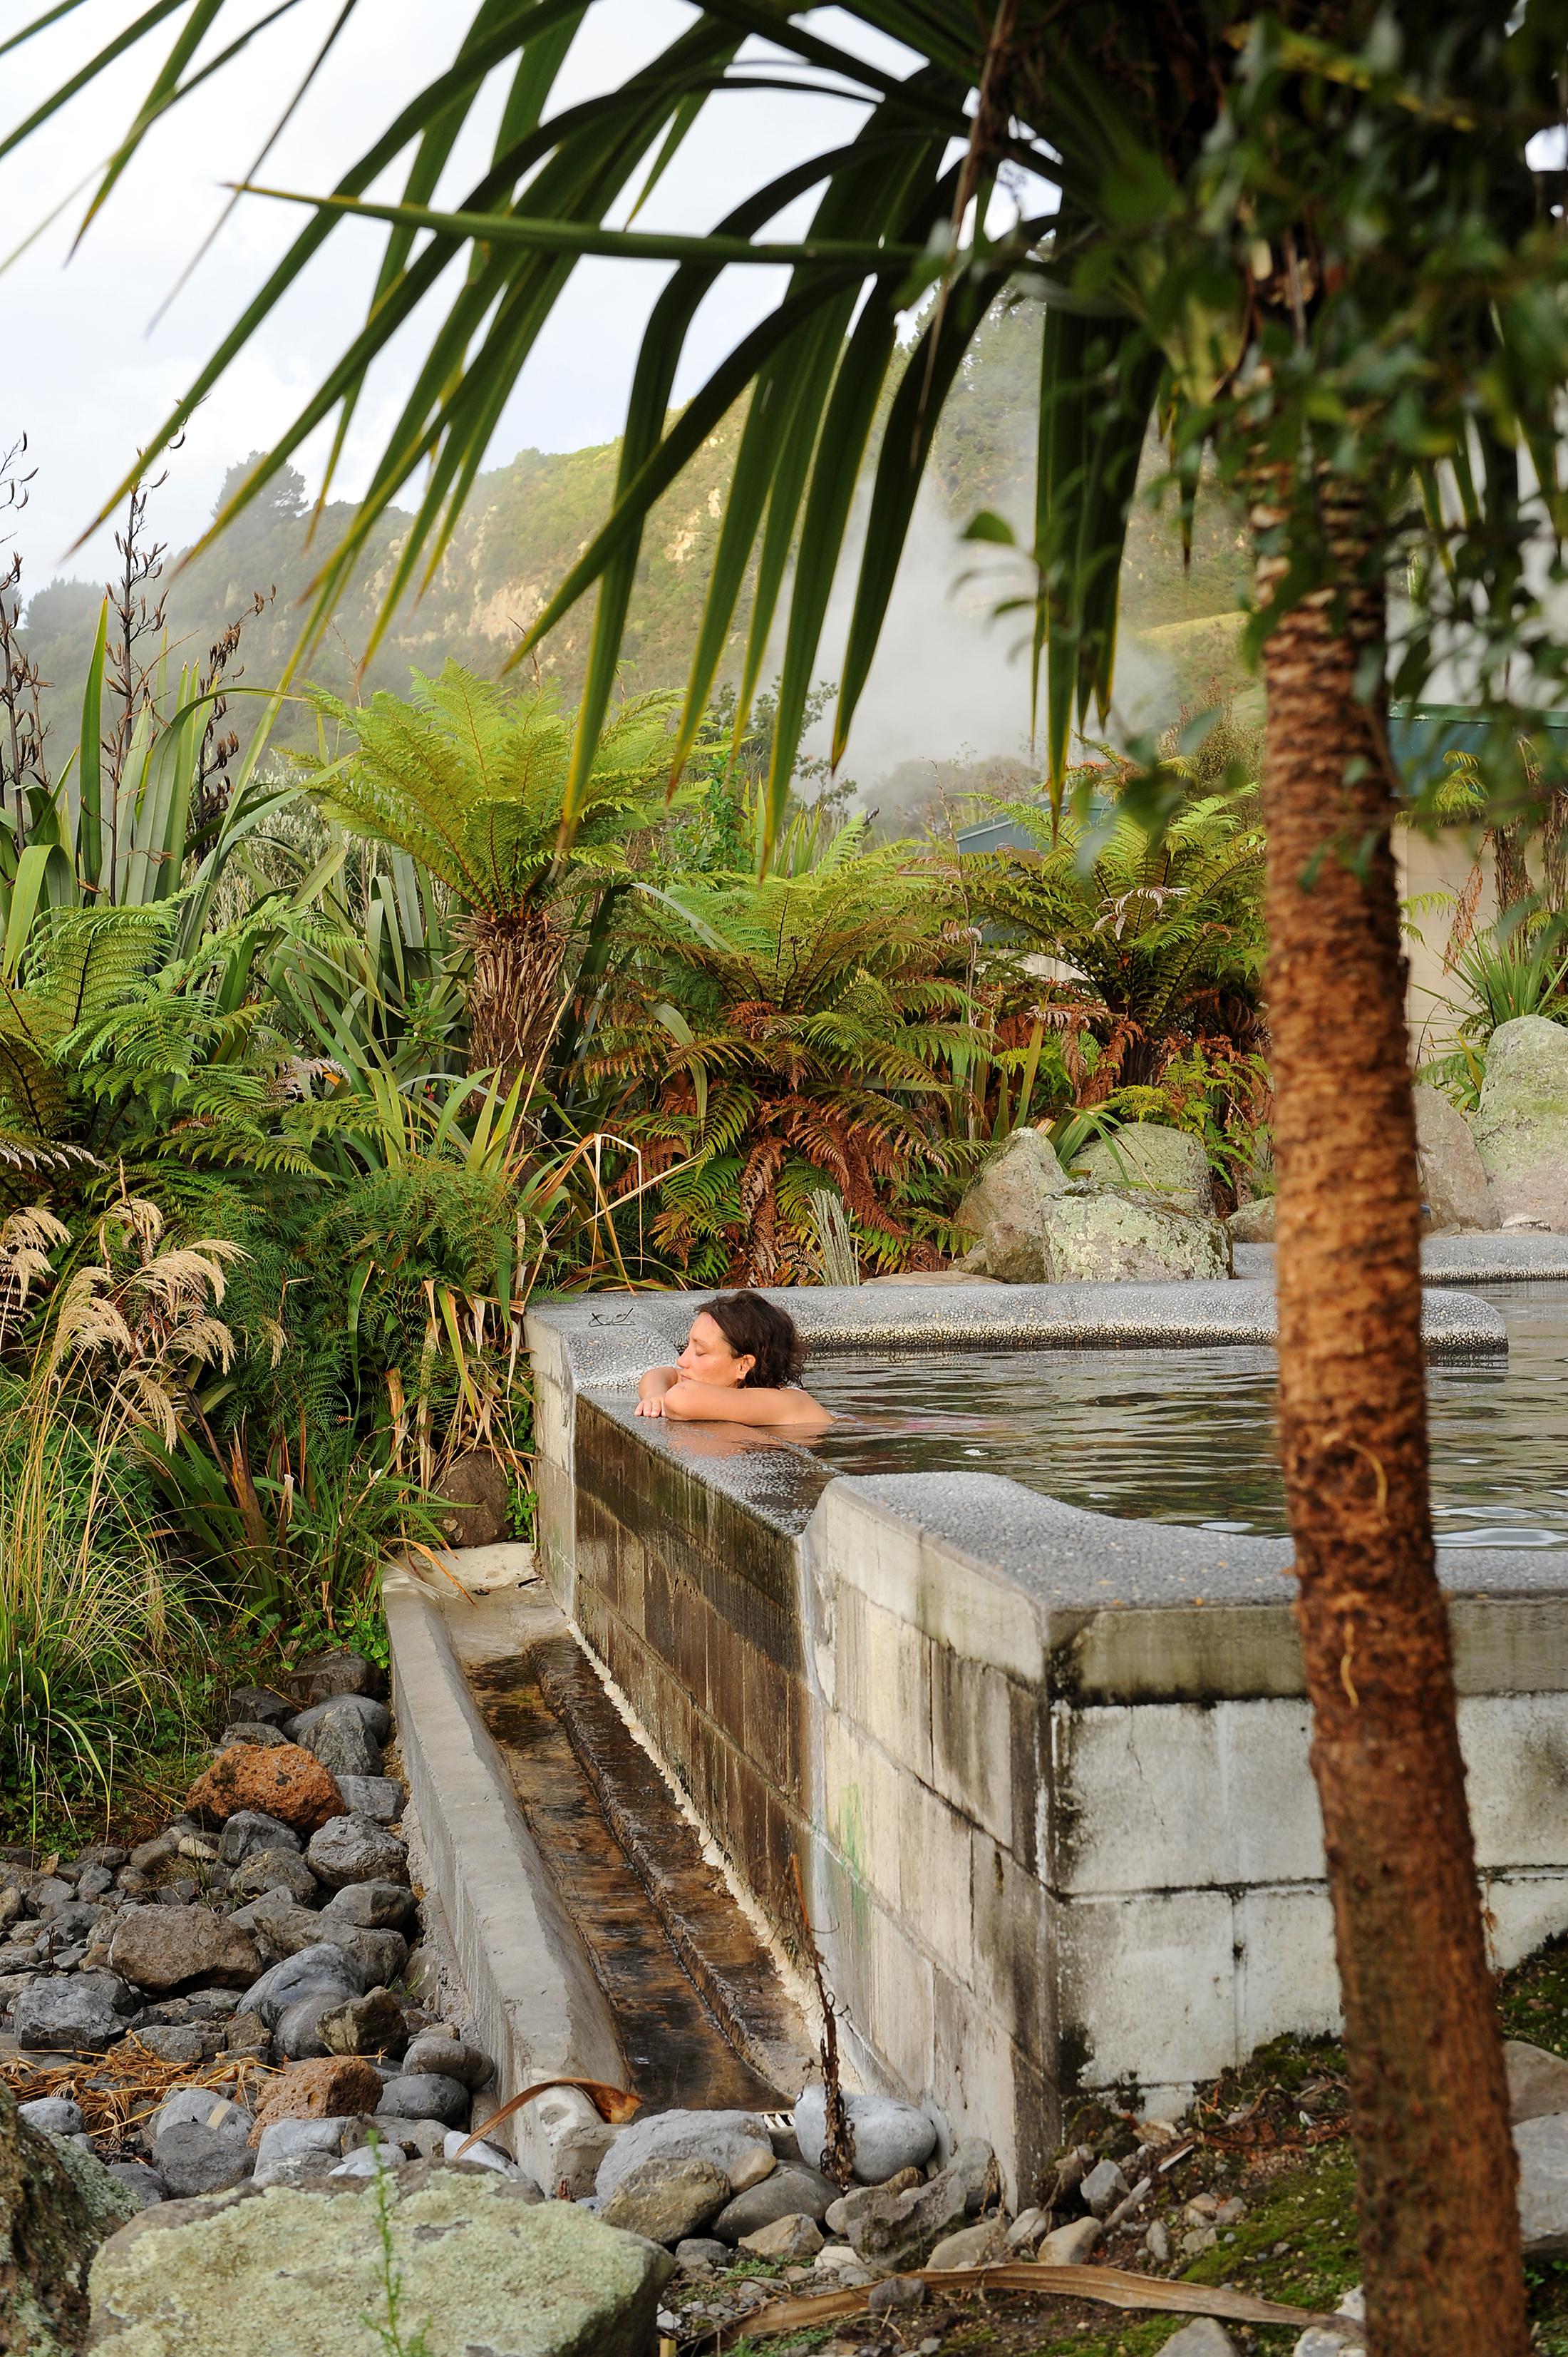 Uusi-Seelanti, allas